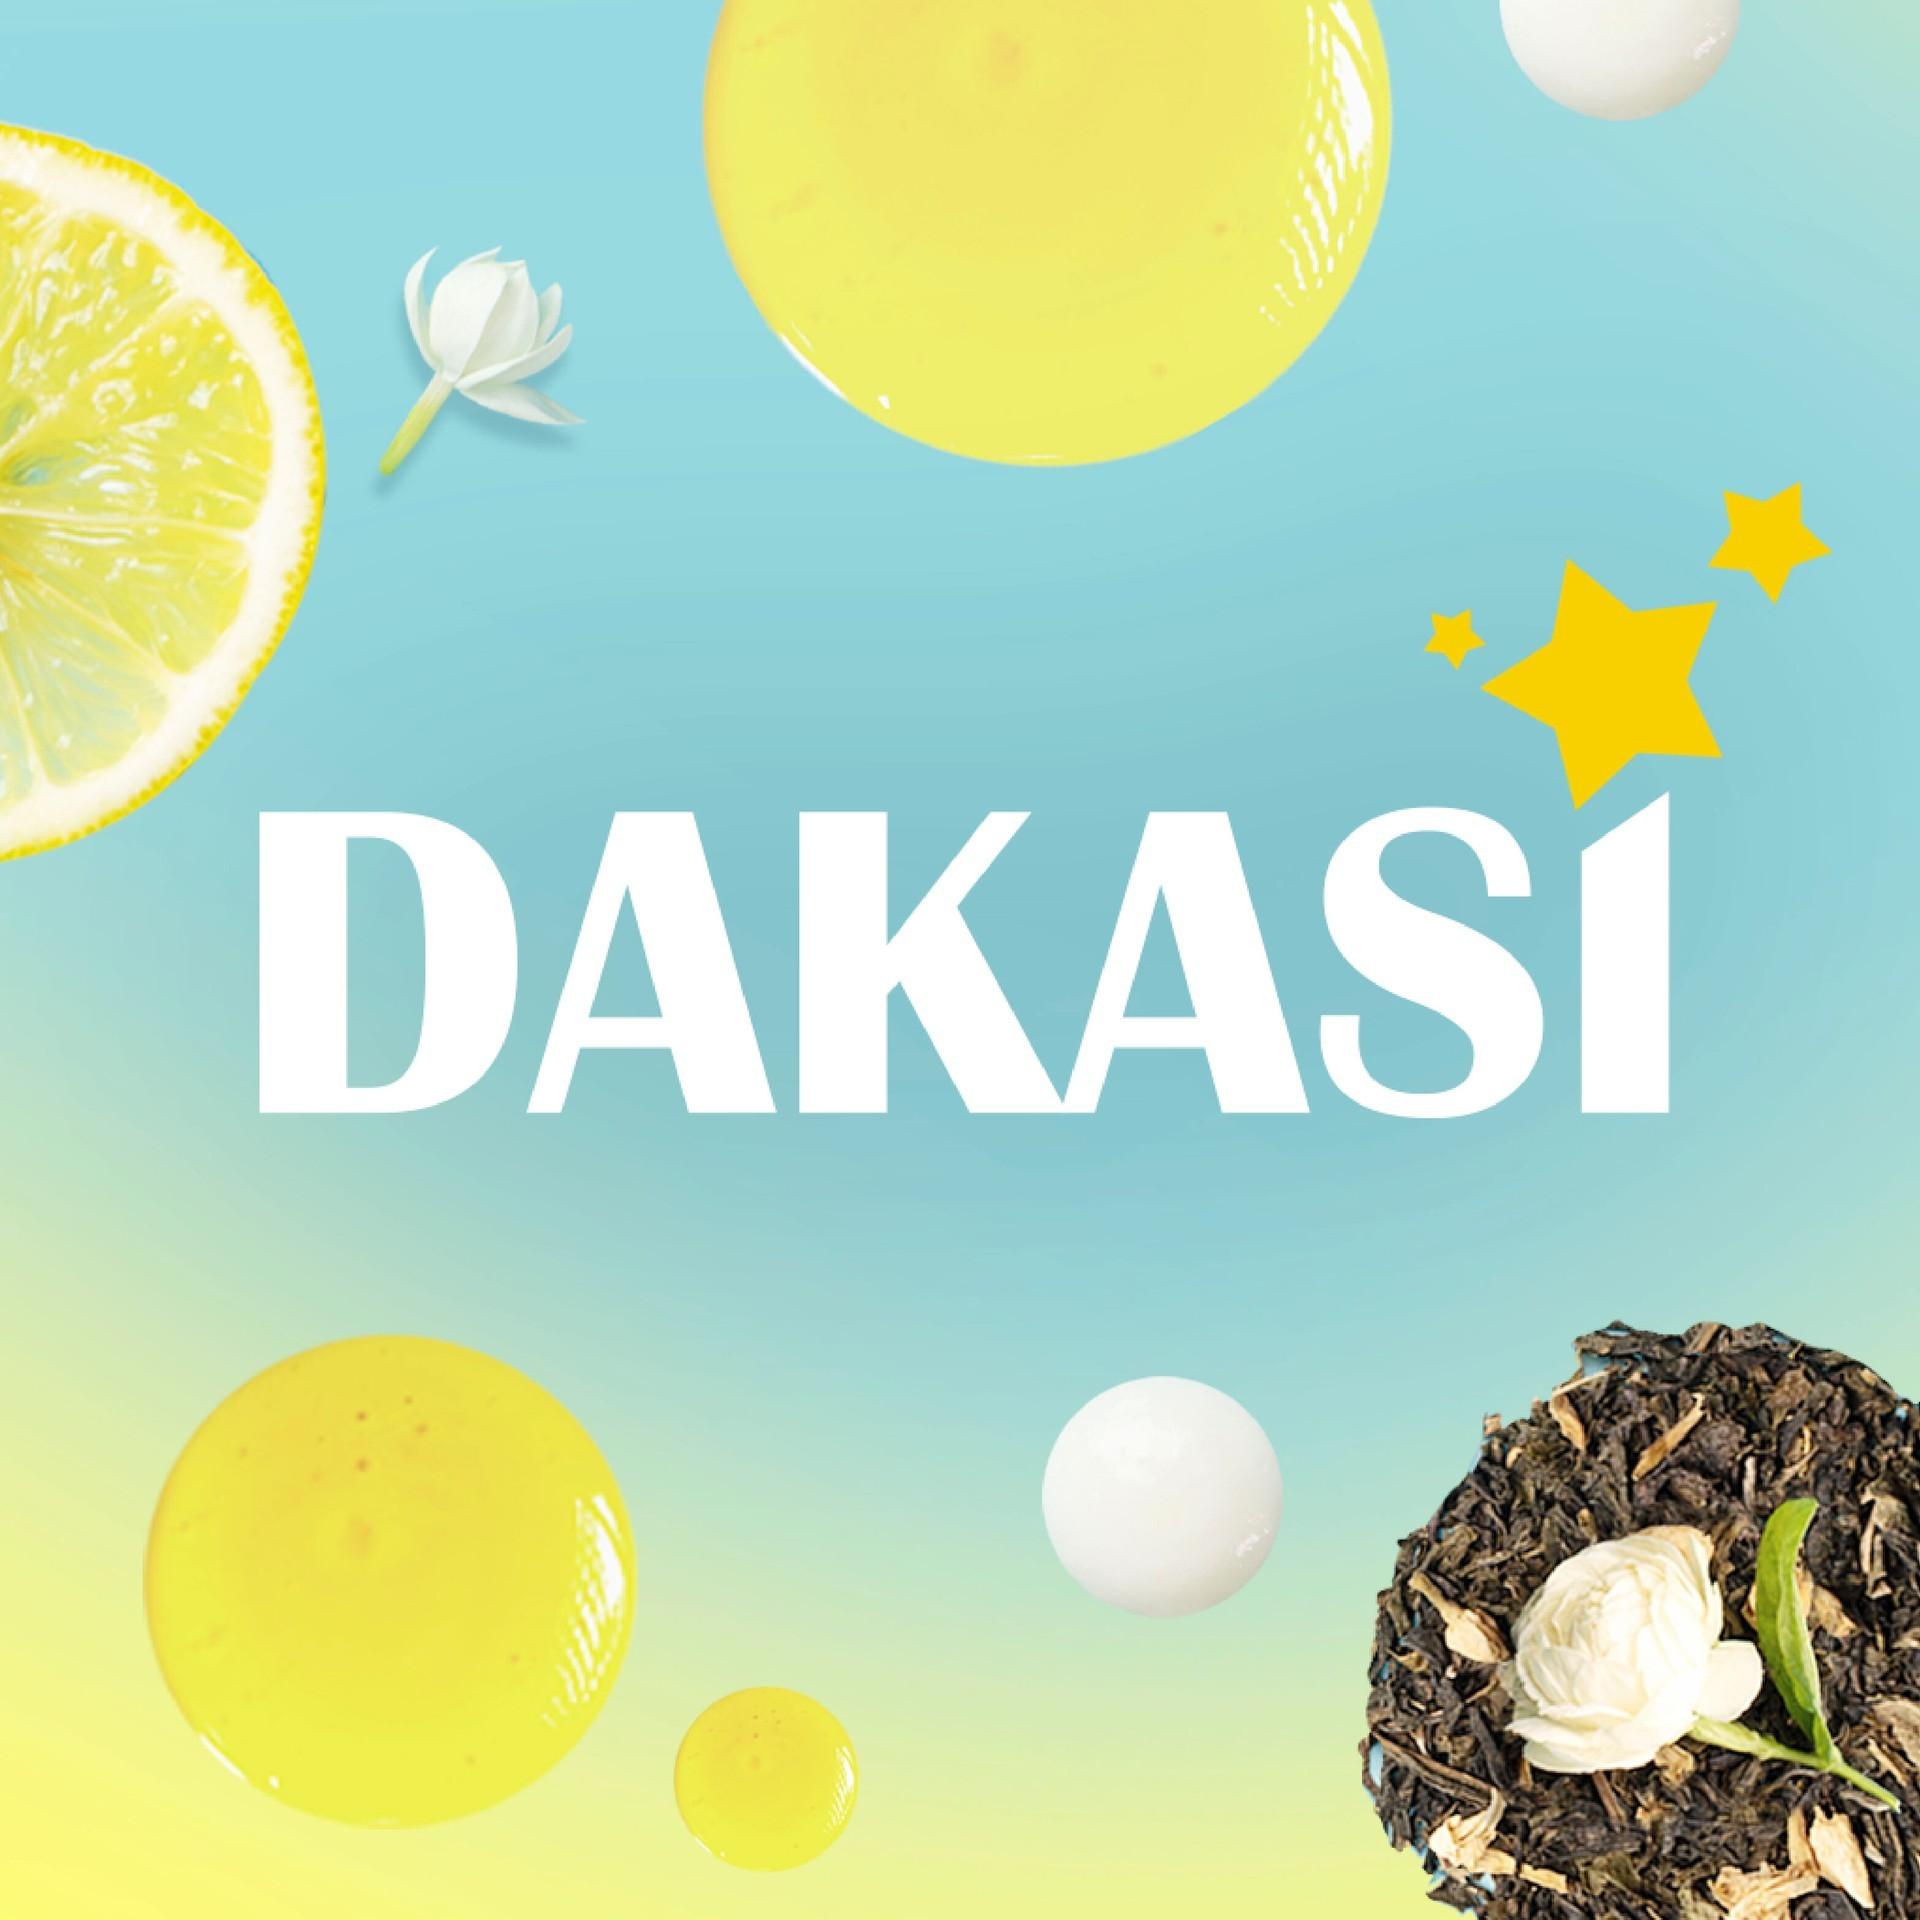 DAKASI (ดาคาซี่)